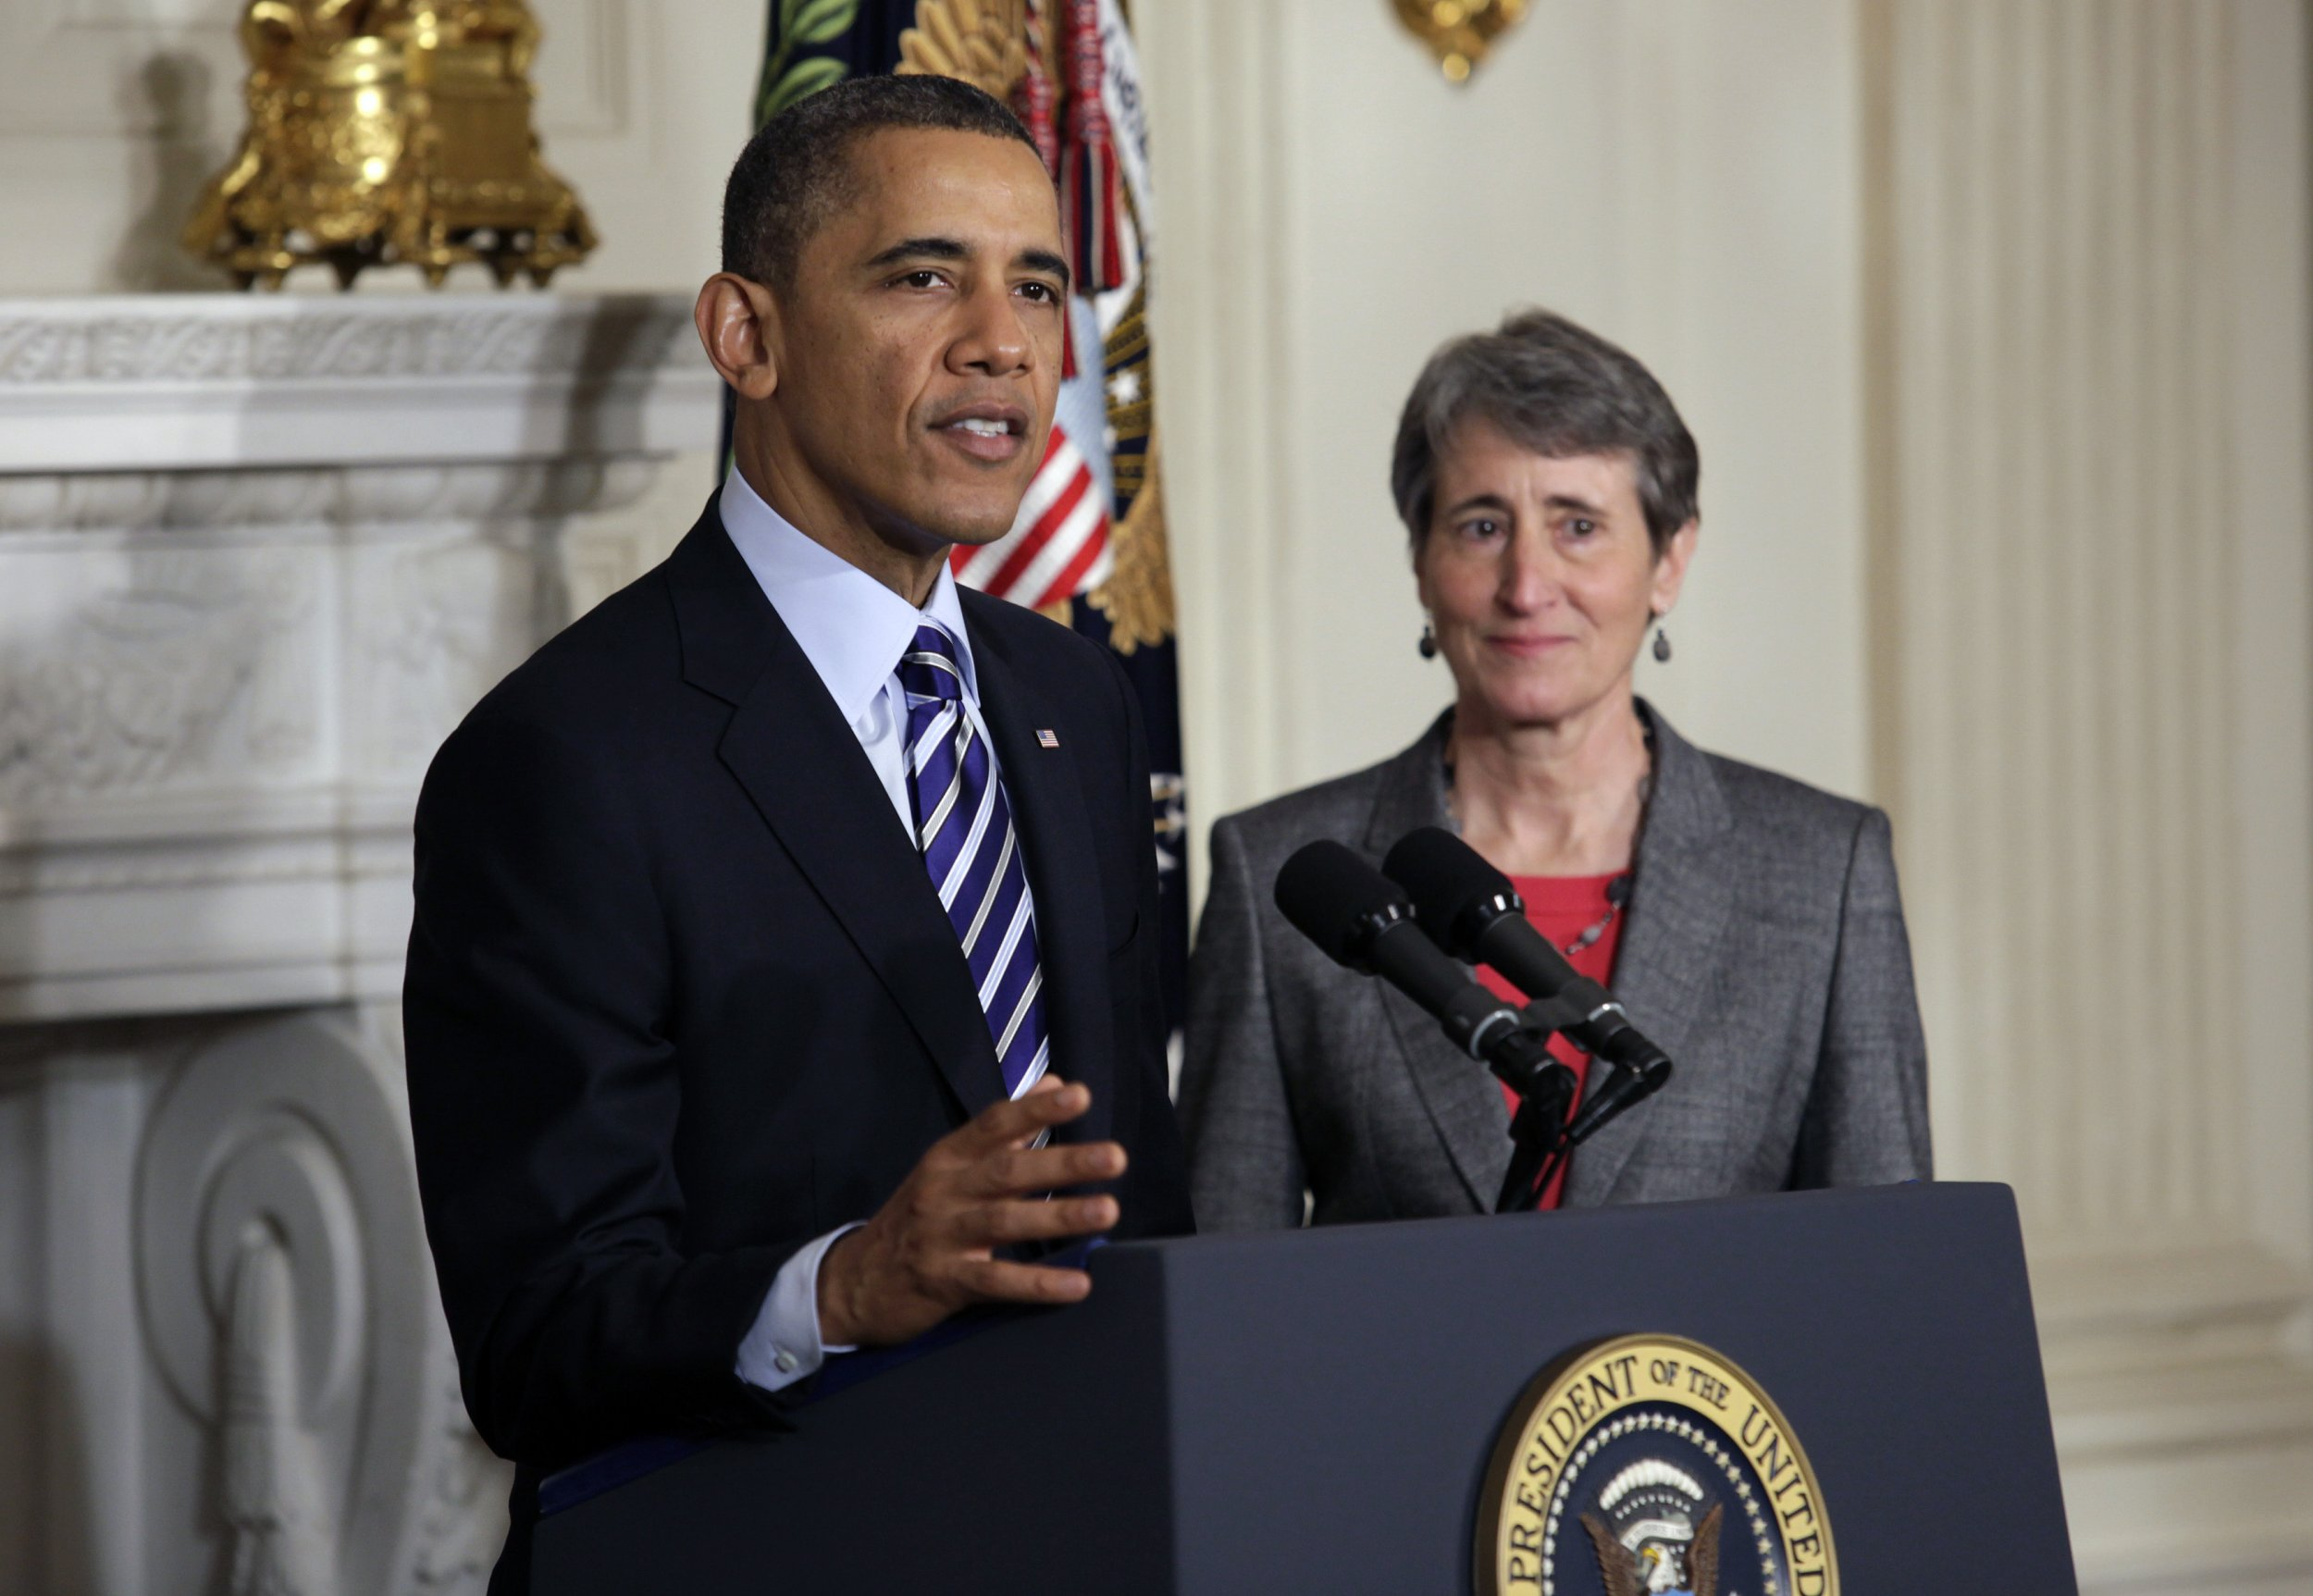 Sally Jewell Announces Overhaul of Coal Program